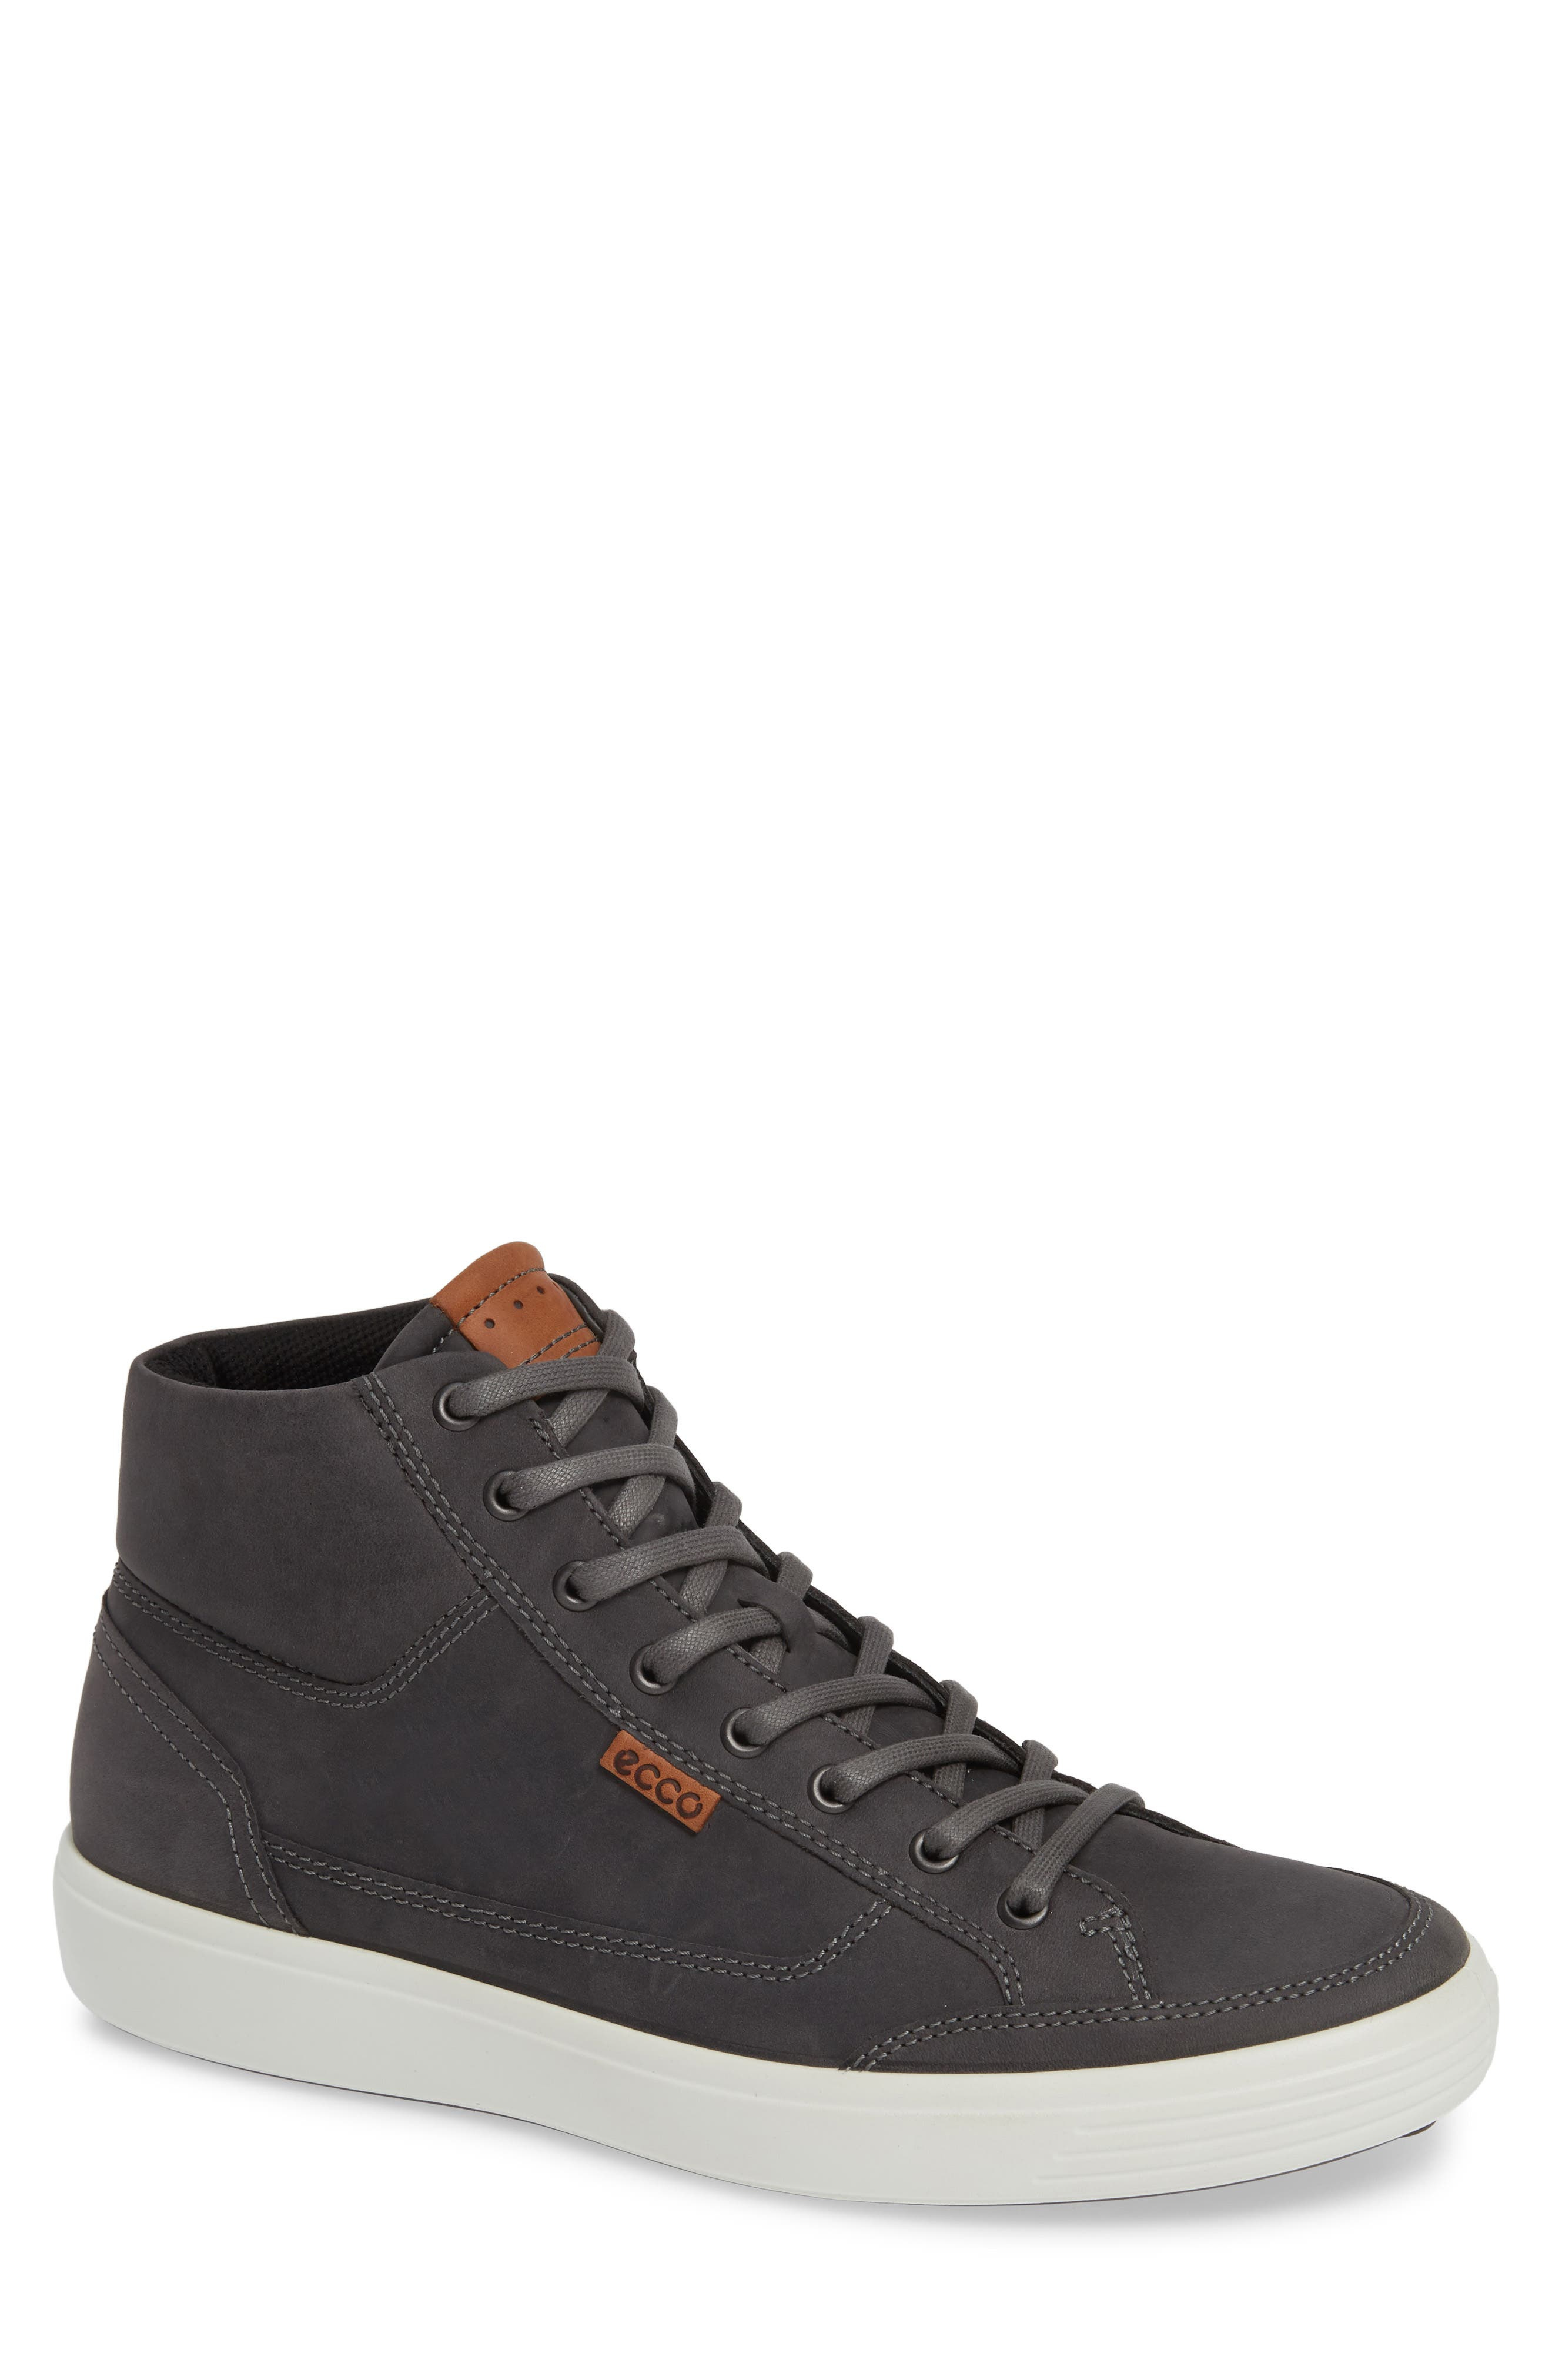 Ecco Soft 7 Sneaker - Grey